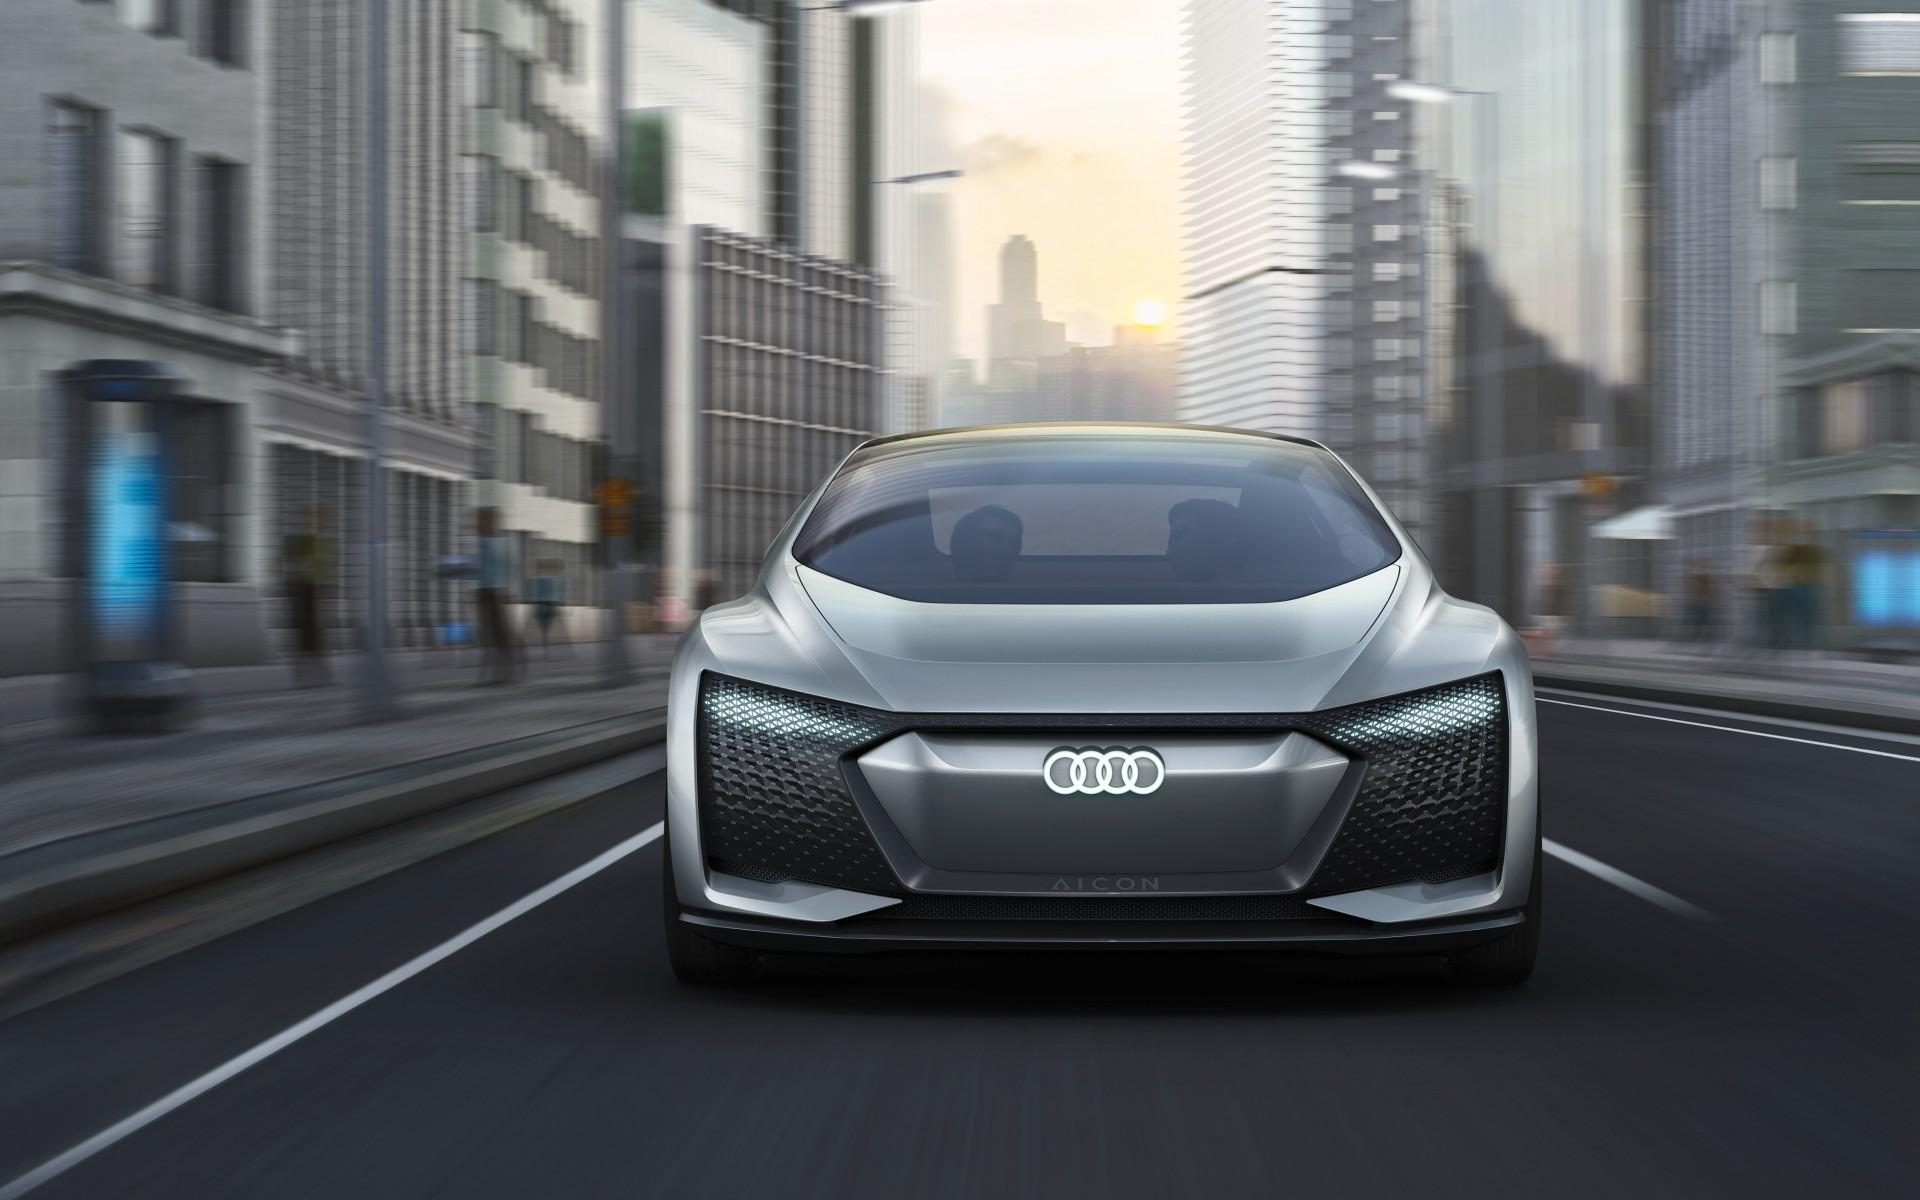 Audi R8 Wallpaper Iphone 6 Audi Aicon 2017 Frankfurt Motor Show 4k Wallpapers Hd